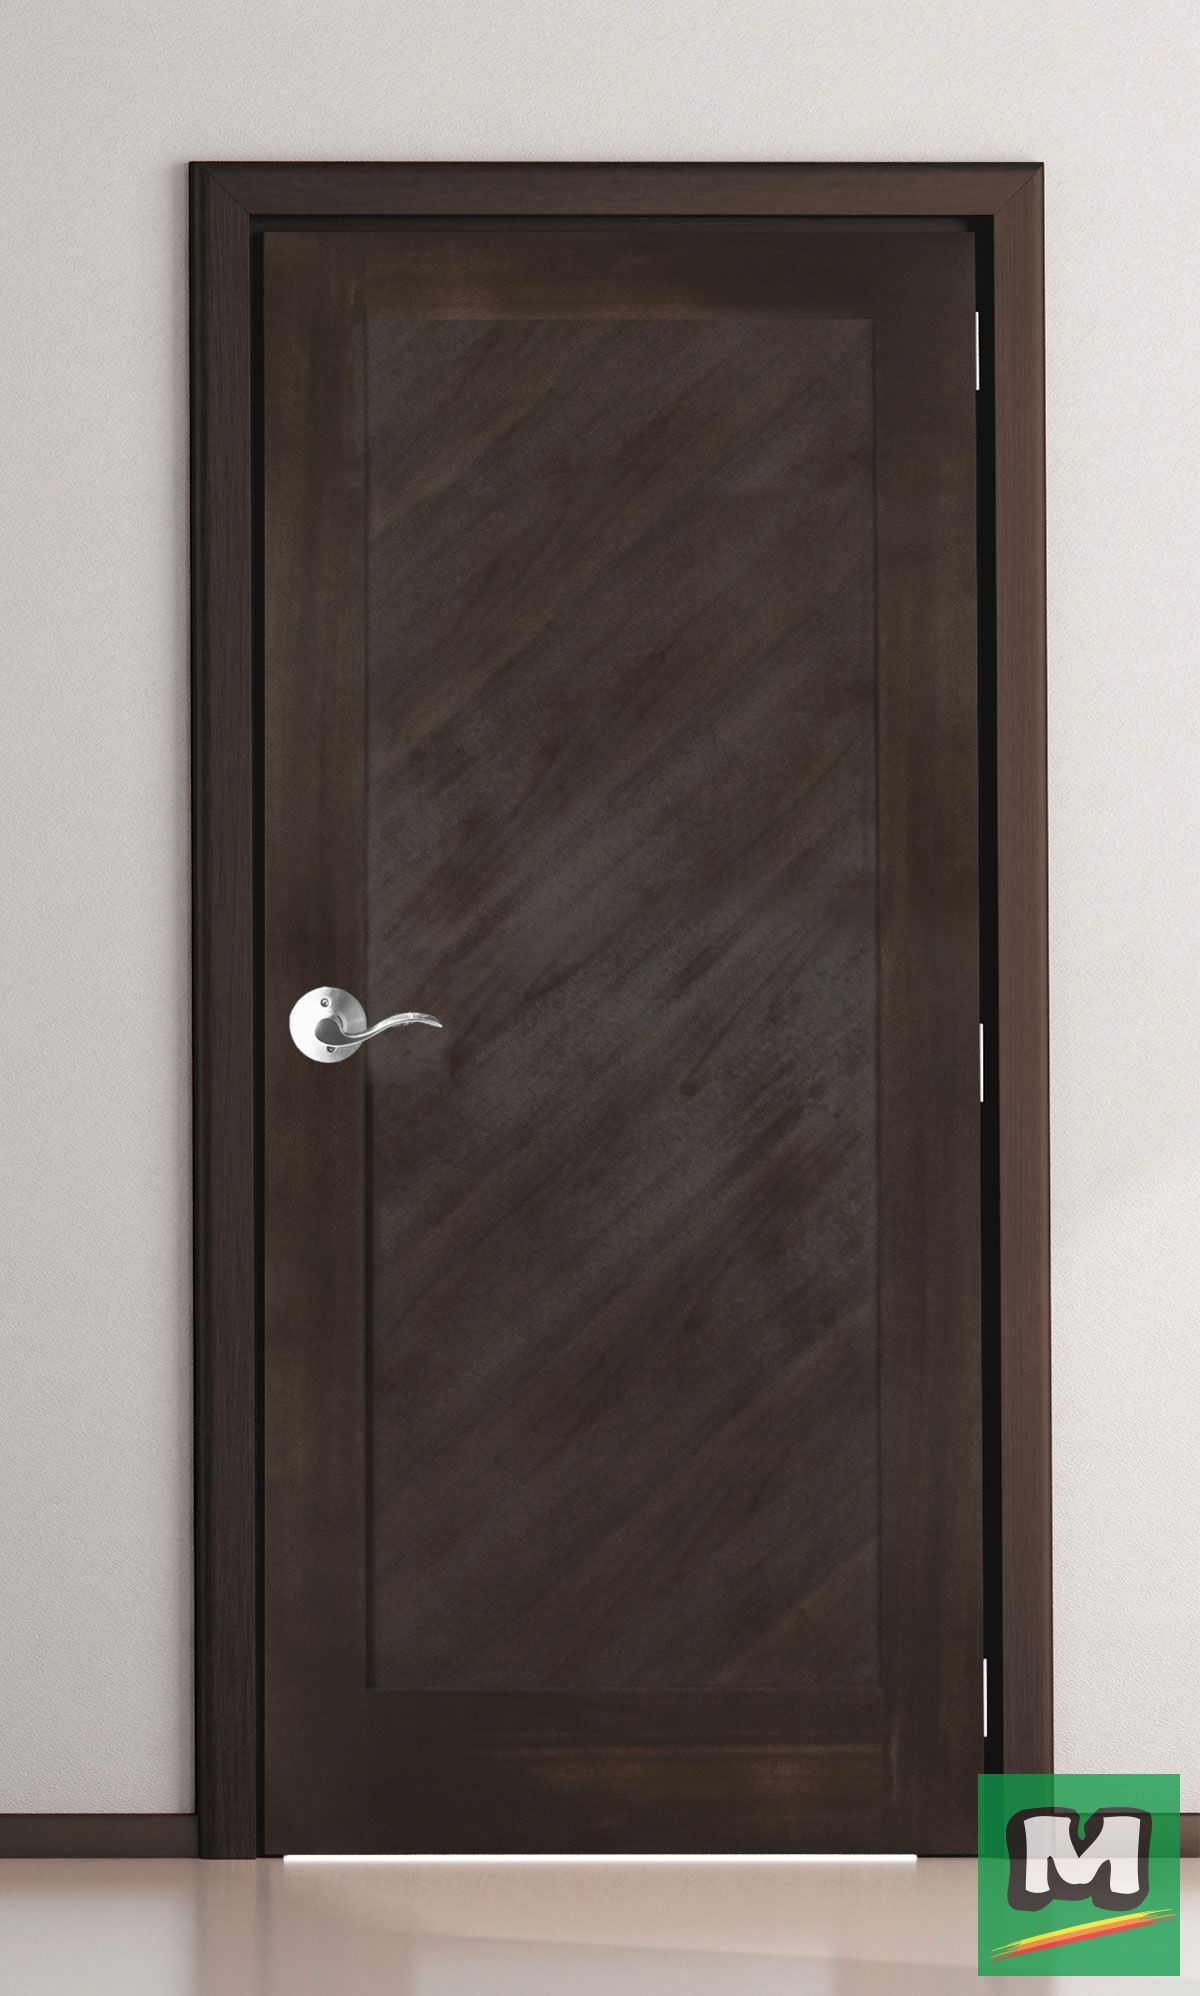 Mastercraft 174 Doors Offer Great Interior Options Including